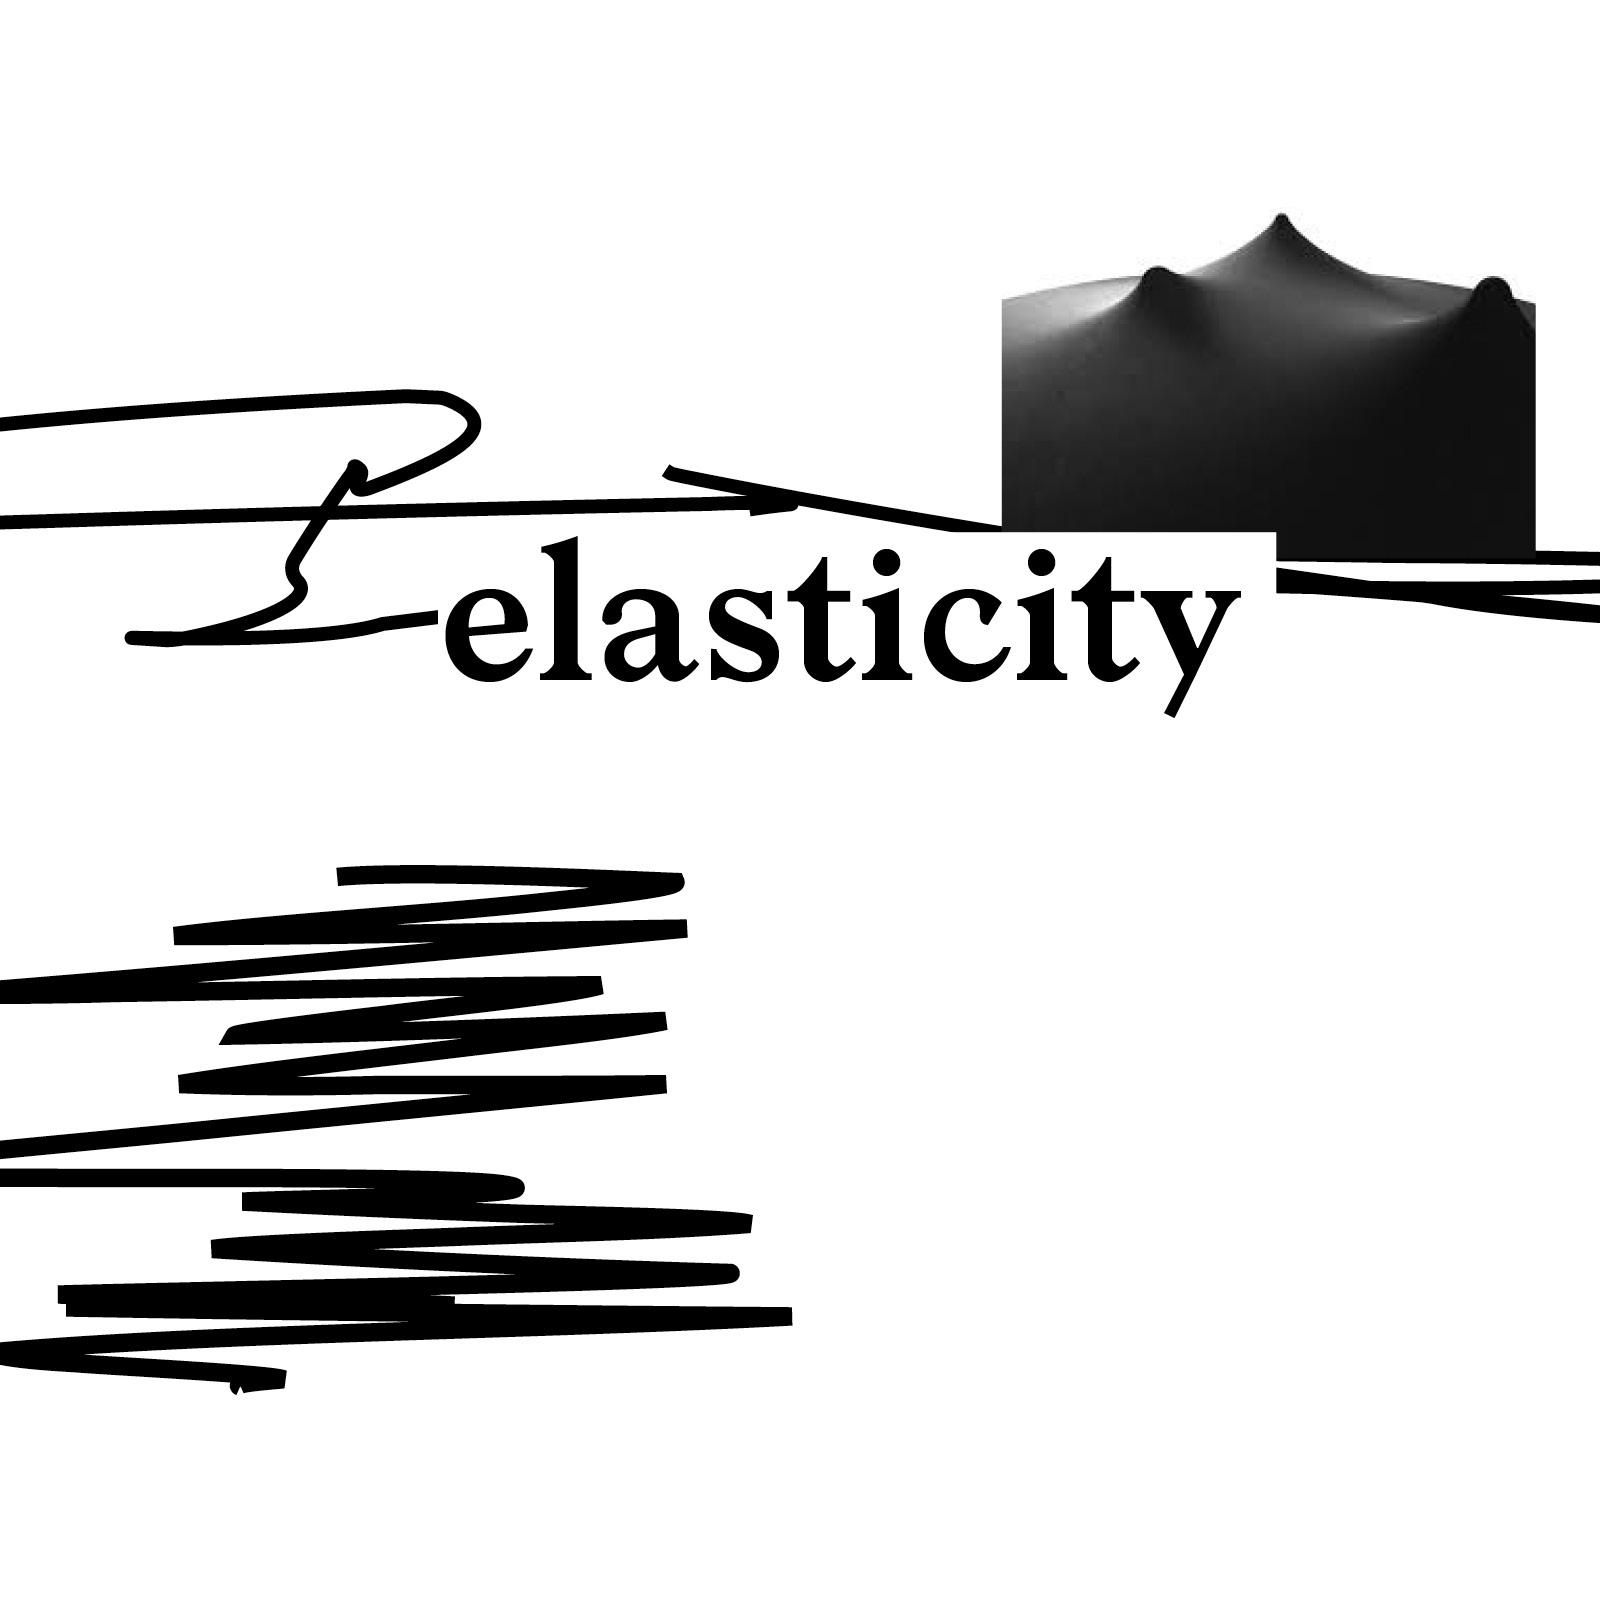 elasticity.jpg